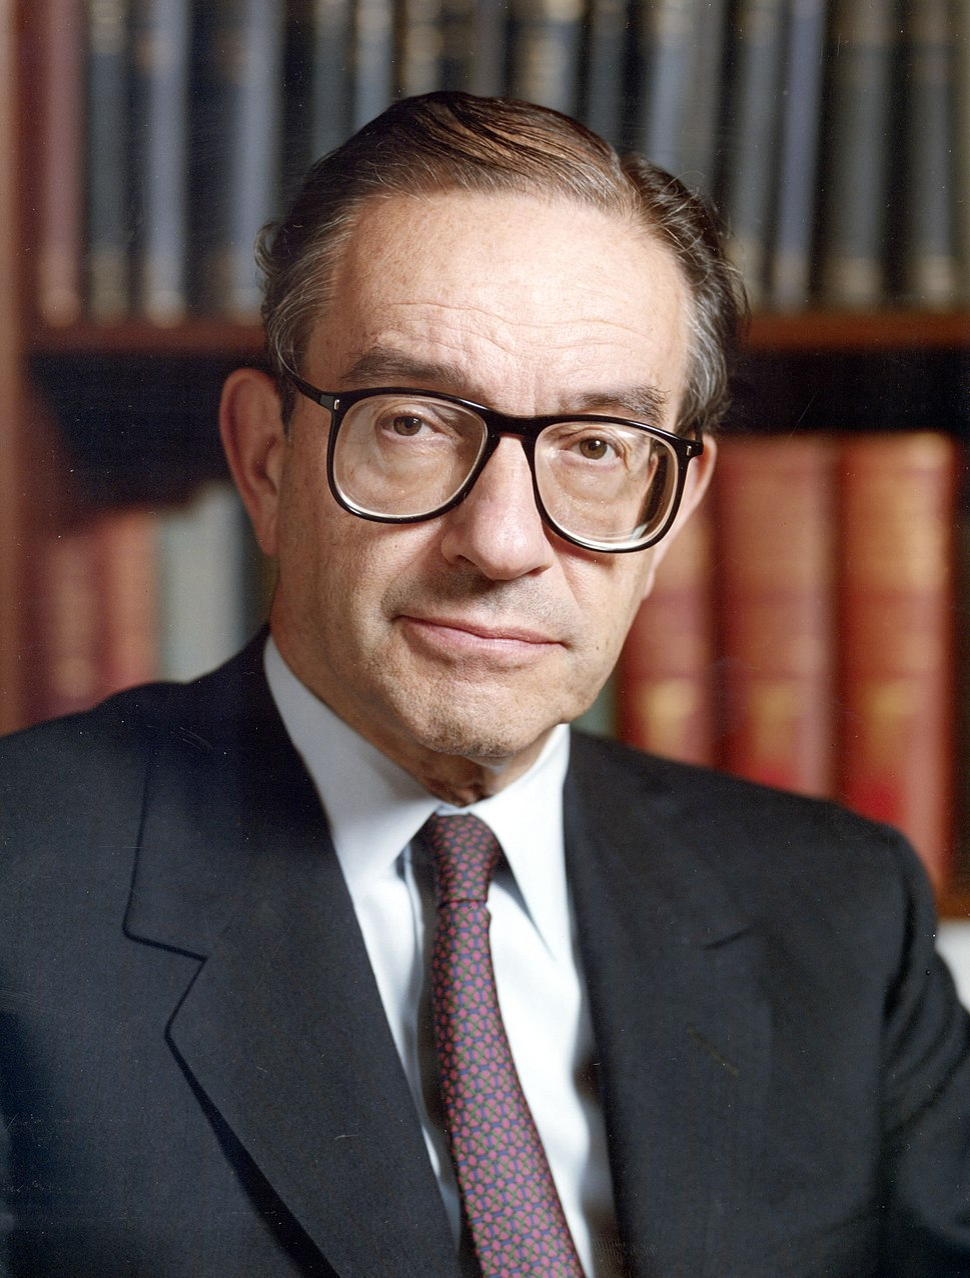 Alan Greenspan color photo portrait